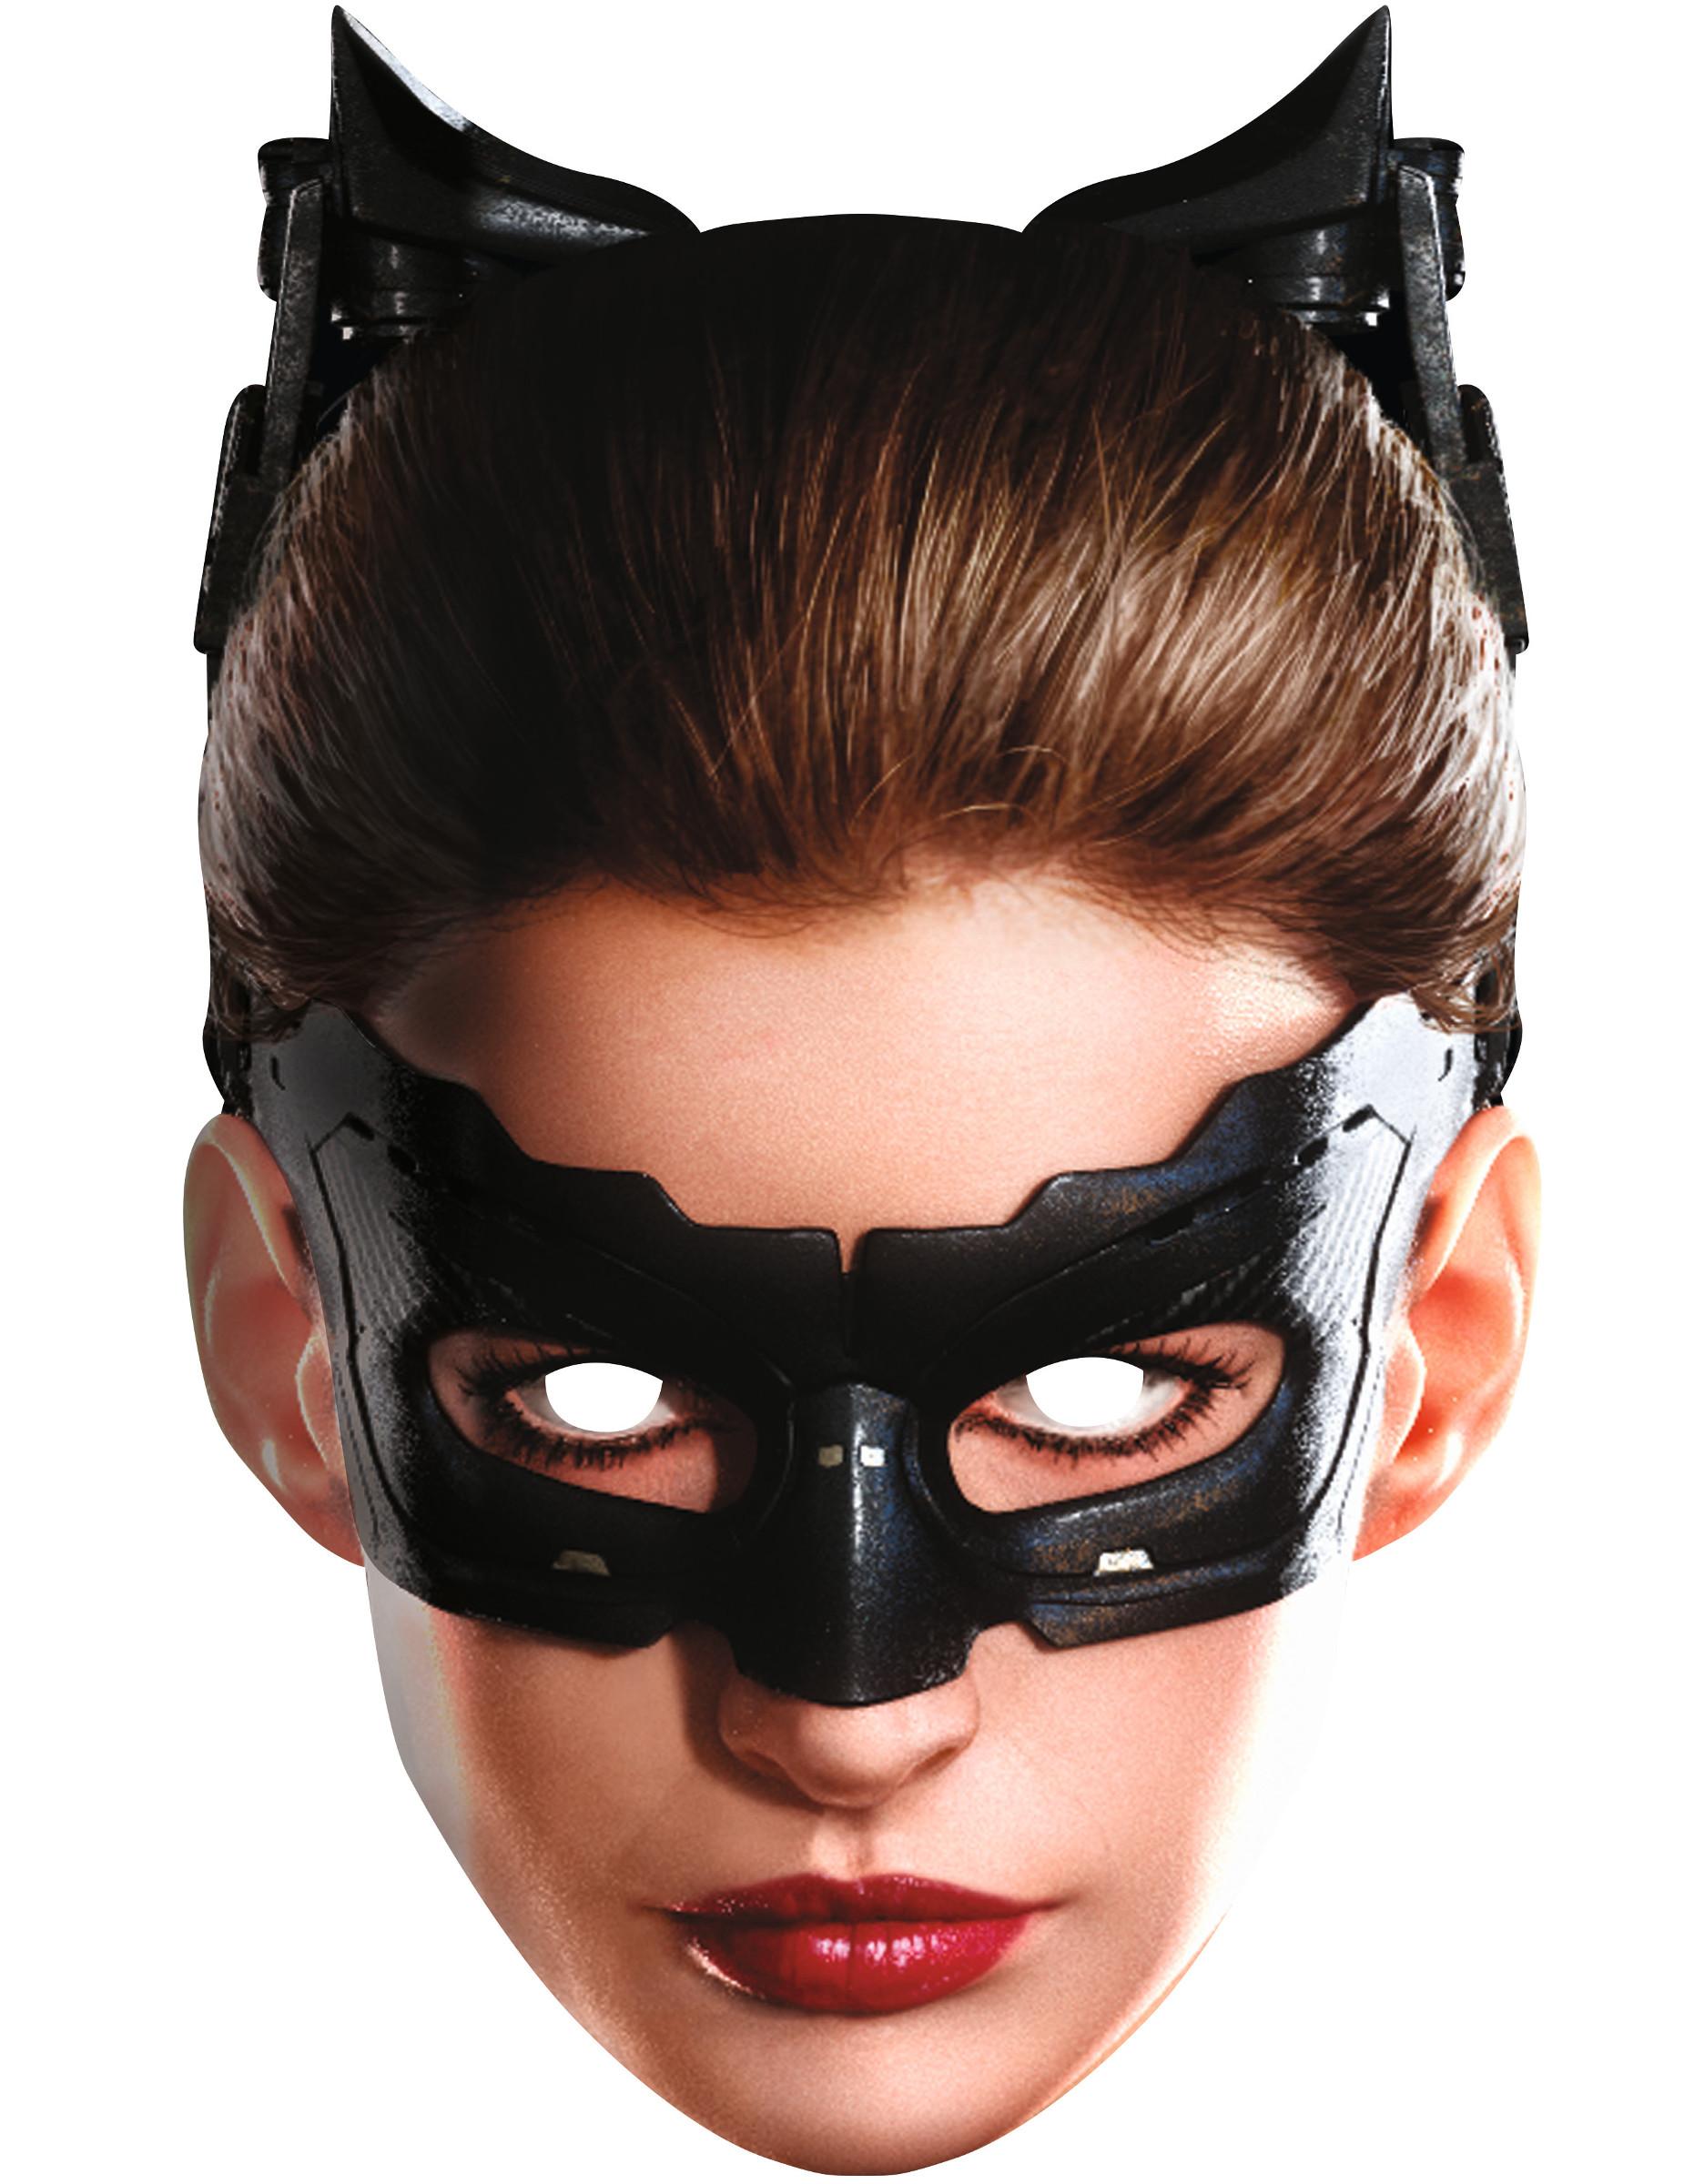 catwoman maske aus karton masken und g nstige faschingskost me vegaoo. Black Bedroom Furniture Sets. Home Design Ideas